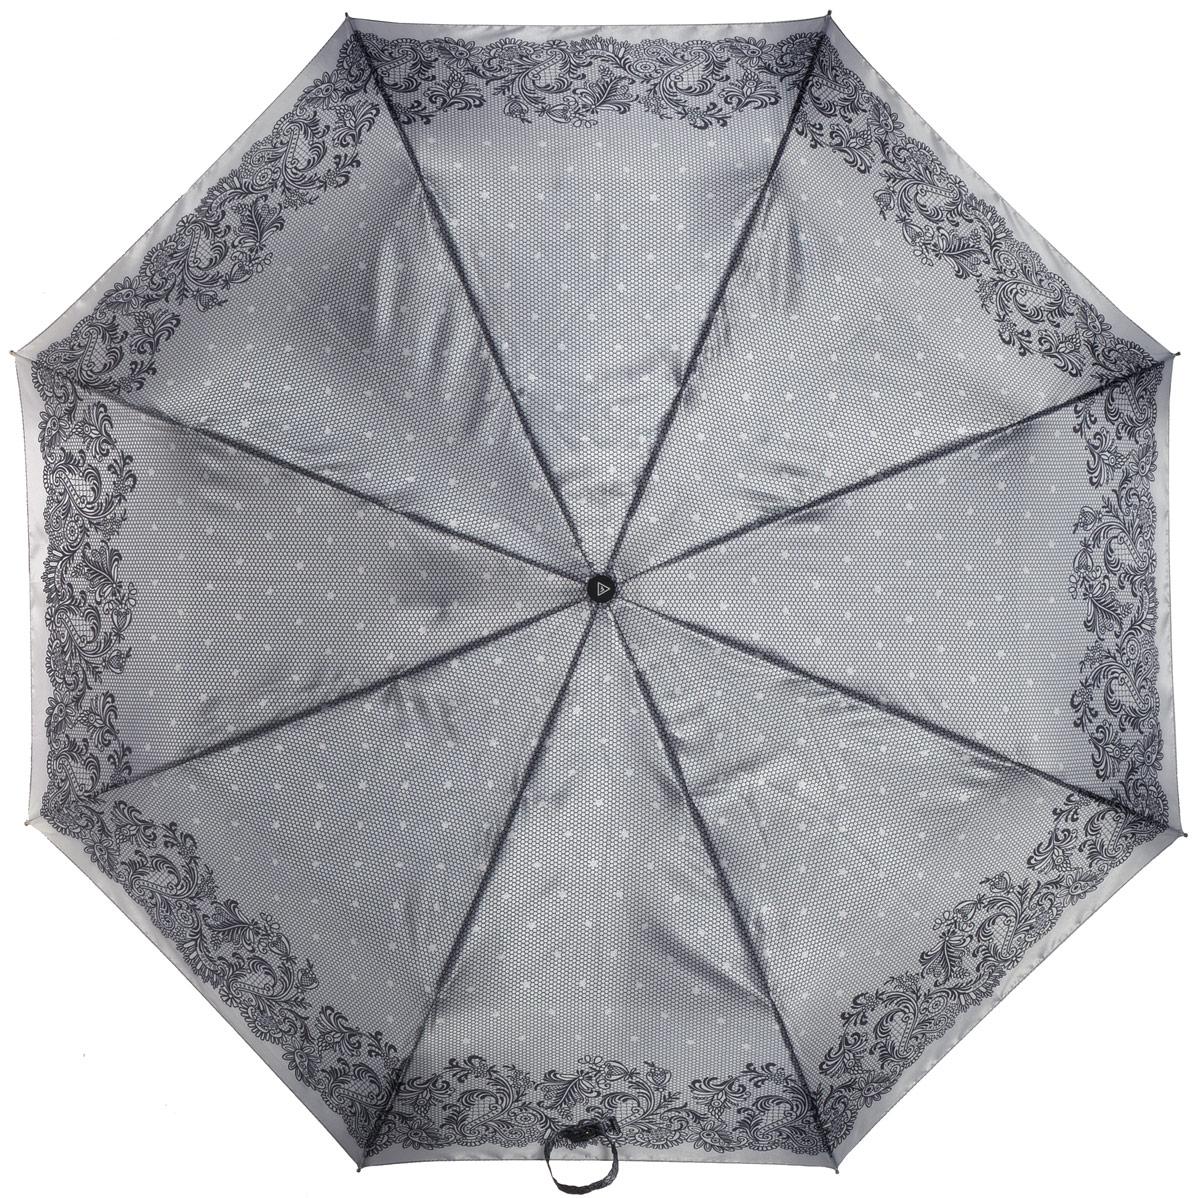 Зонт женский Fabretti, автомат, 3 сложения, цвет: серый. L-16104-21L-16104-21Зонт женский Fabretti, облегченный суперавтомат, 3 сложения